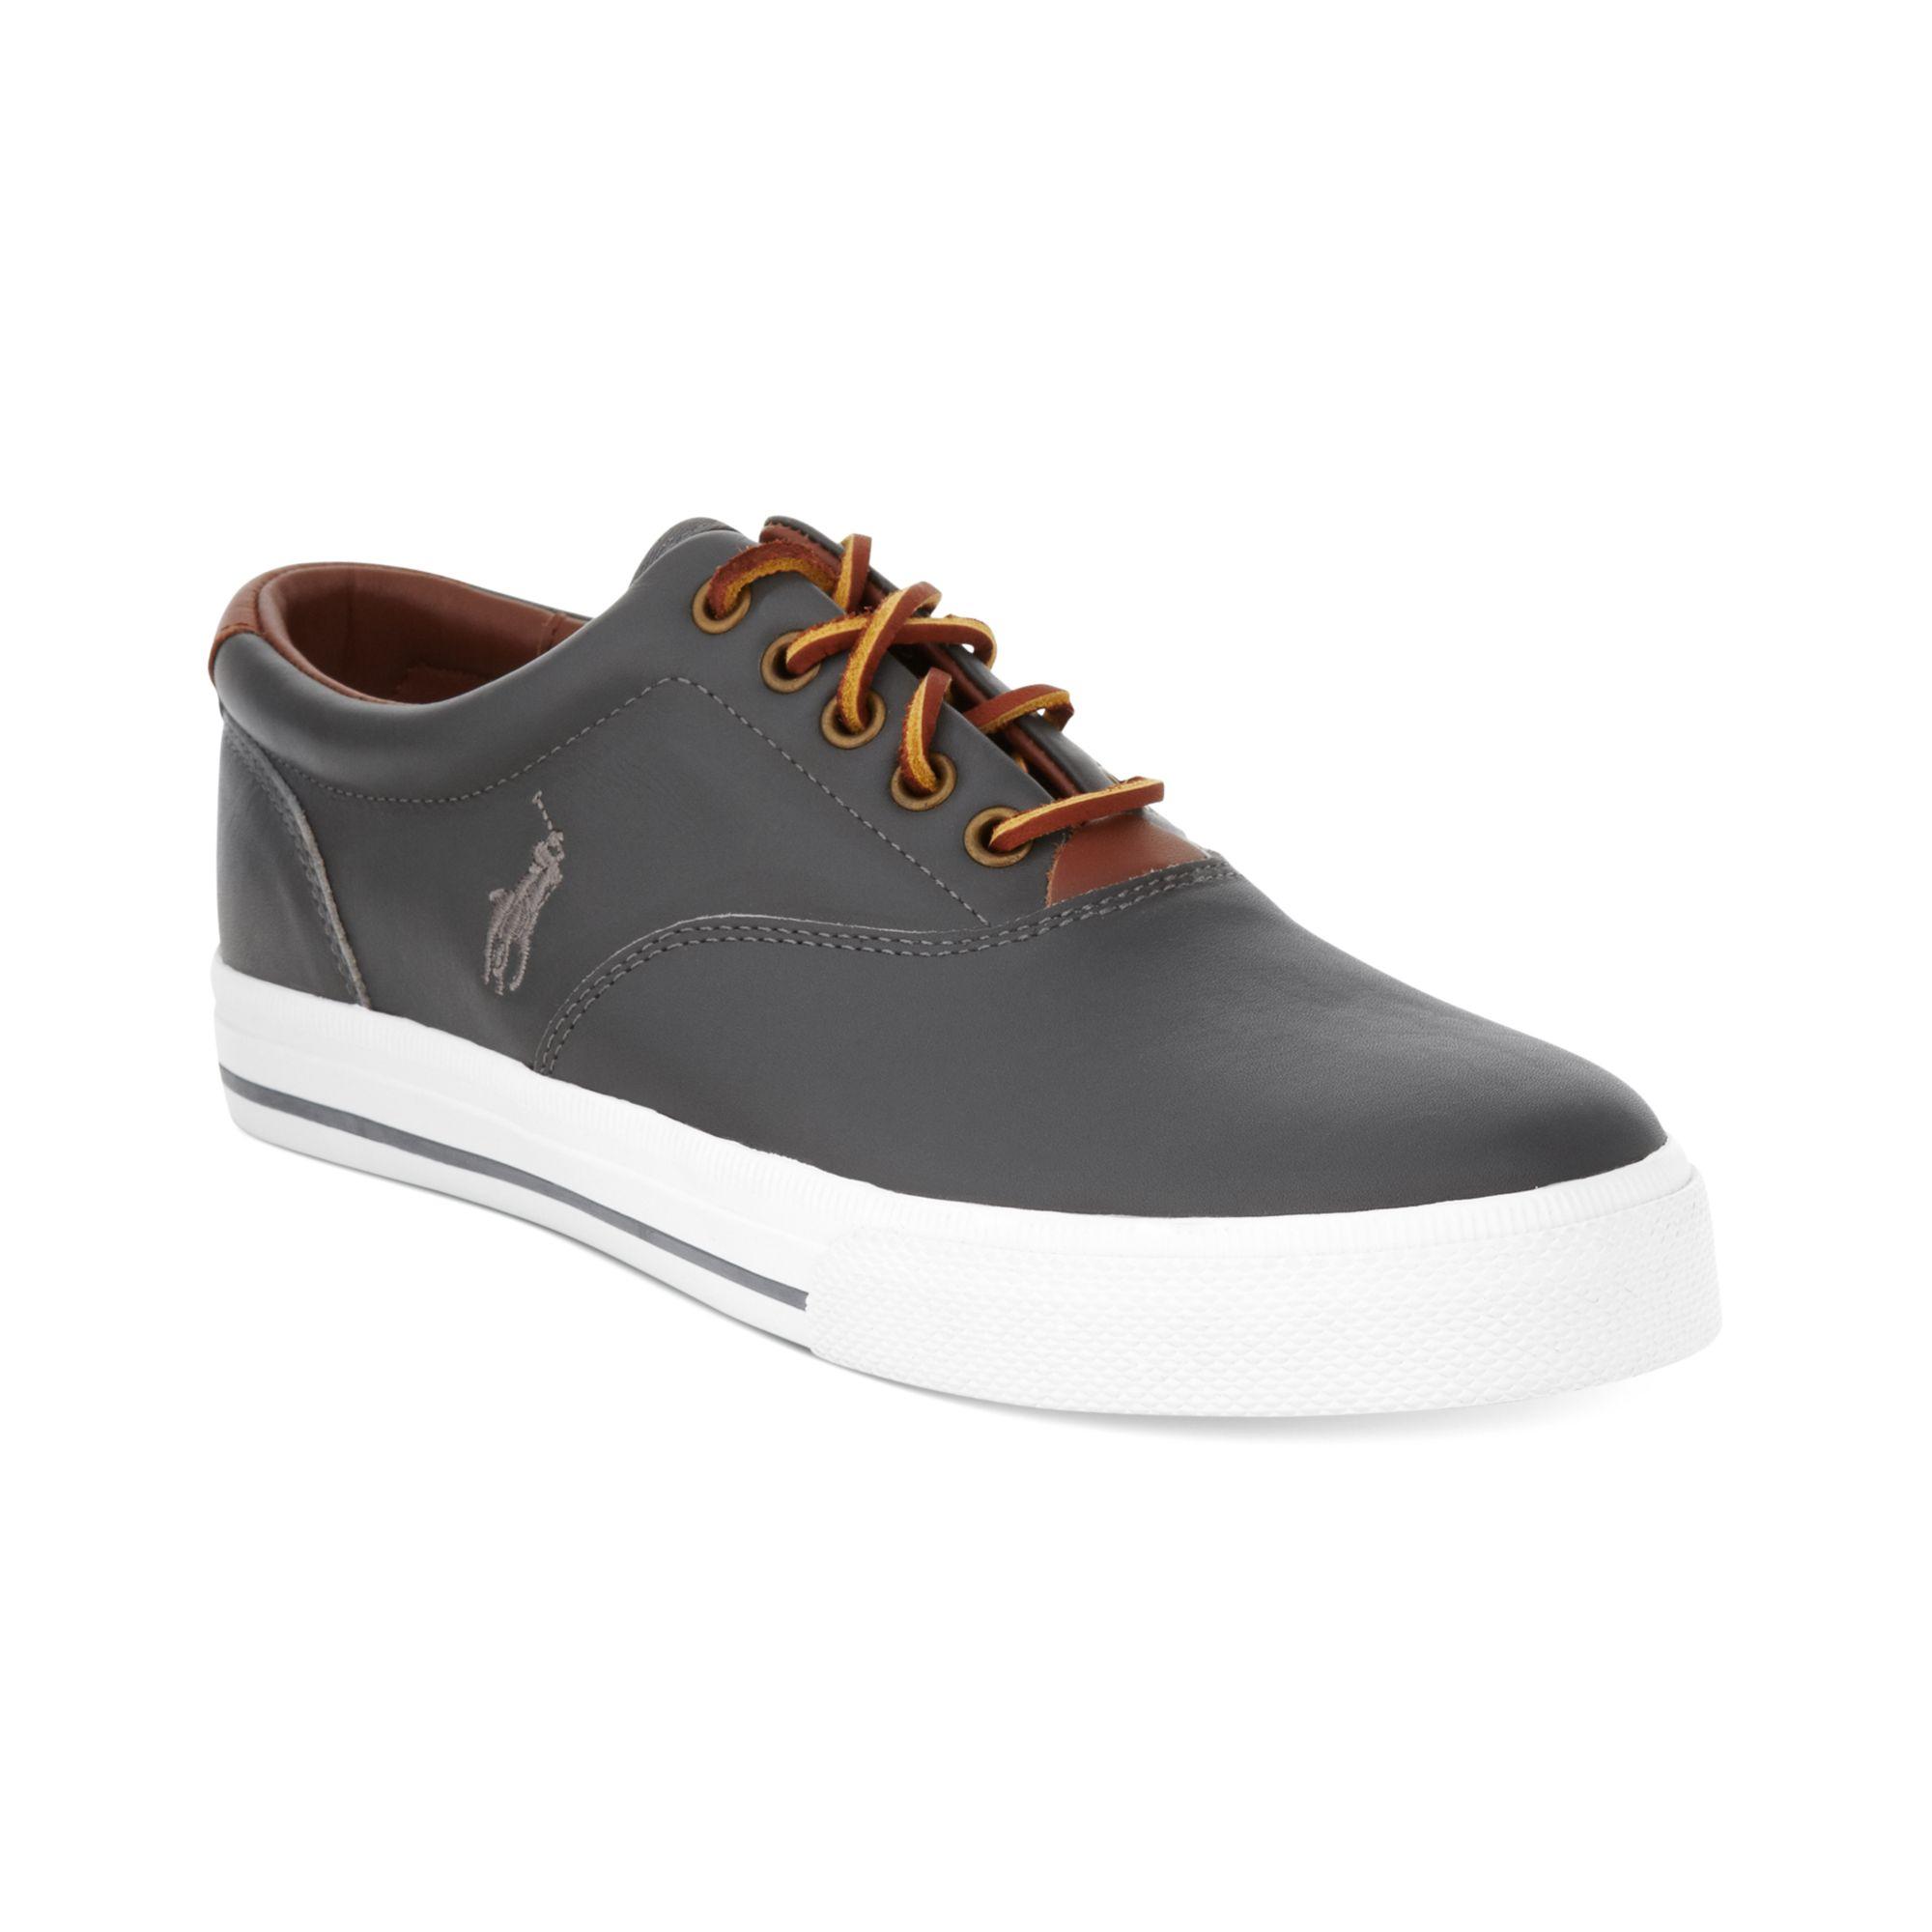 ralph lauren vaughn leather sneakers in brown for men grey lyst. Black Bedroom Furniture Sets. Home Design Ideas